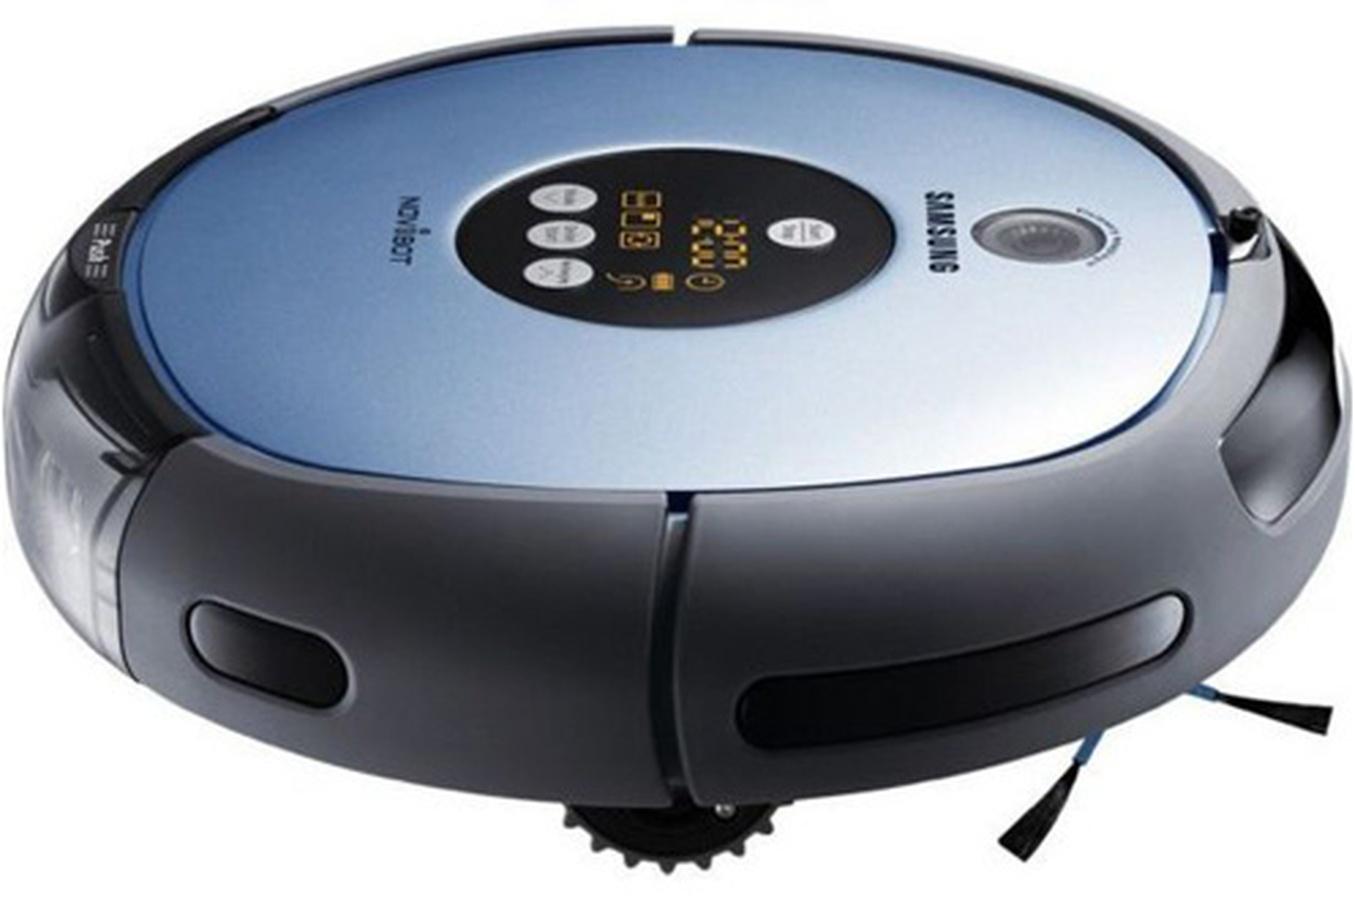 Samsung VCR8847T3BXEF Aspirateur Robot SR8847 avec